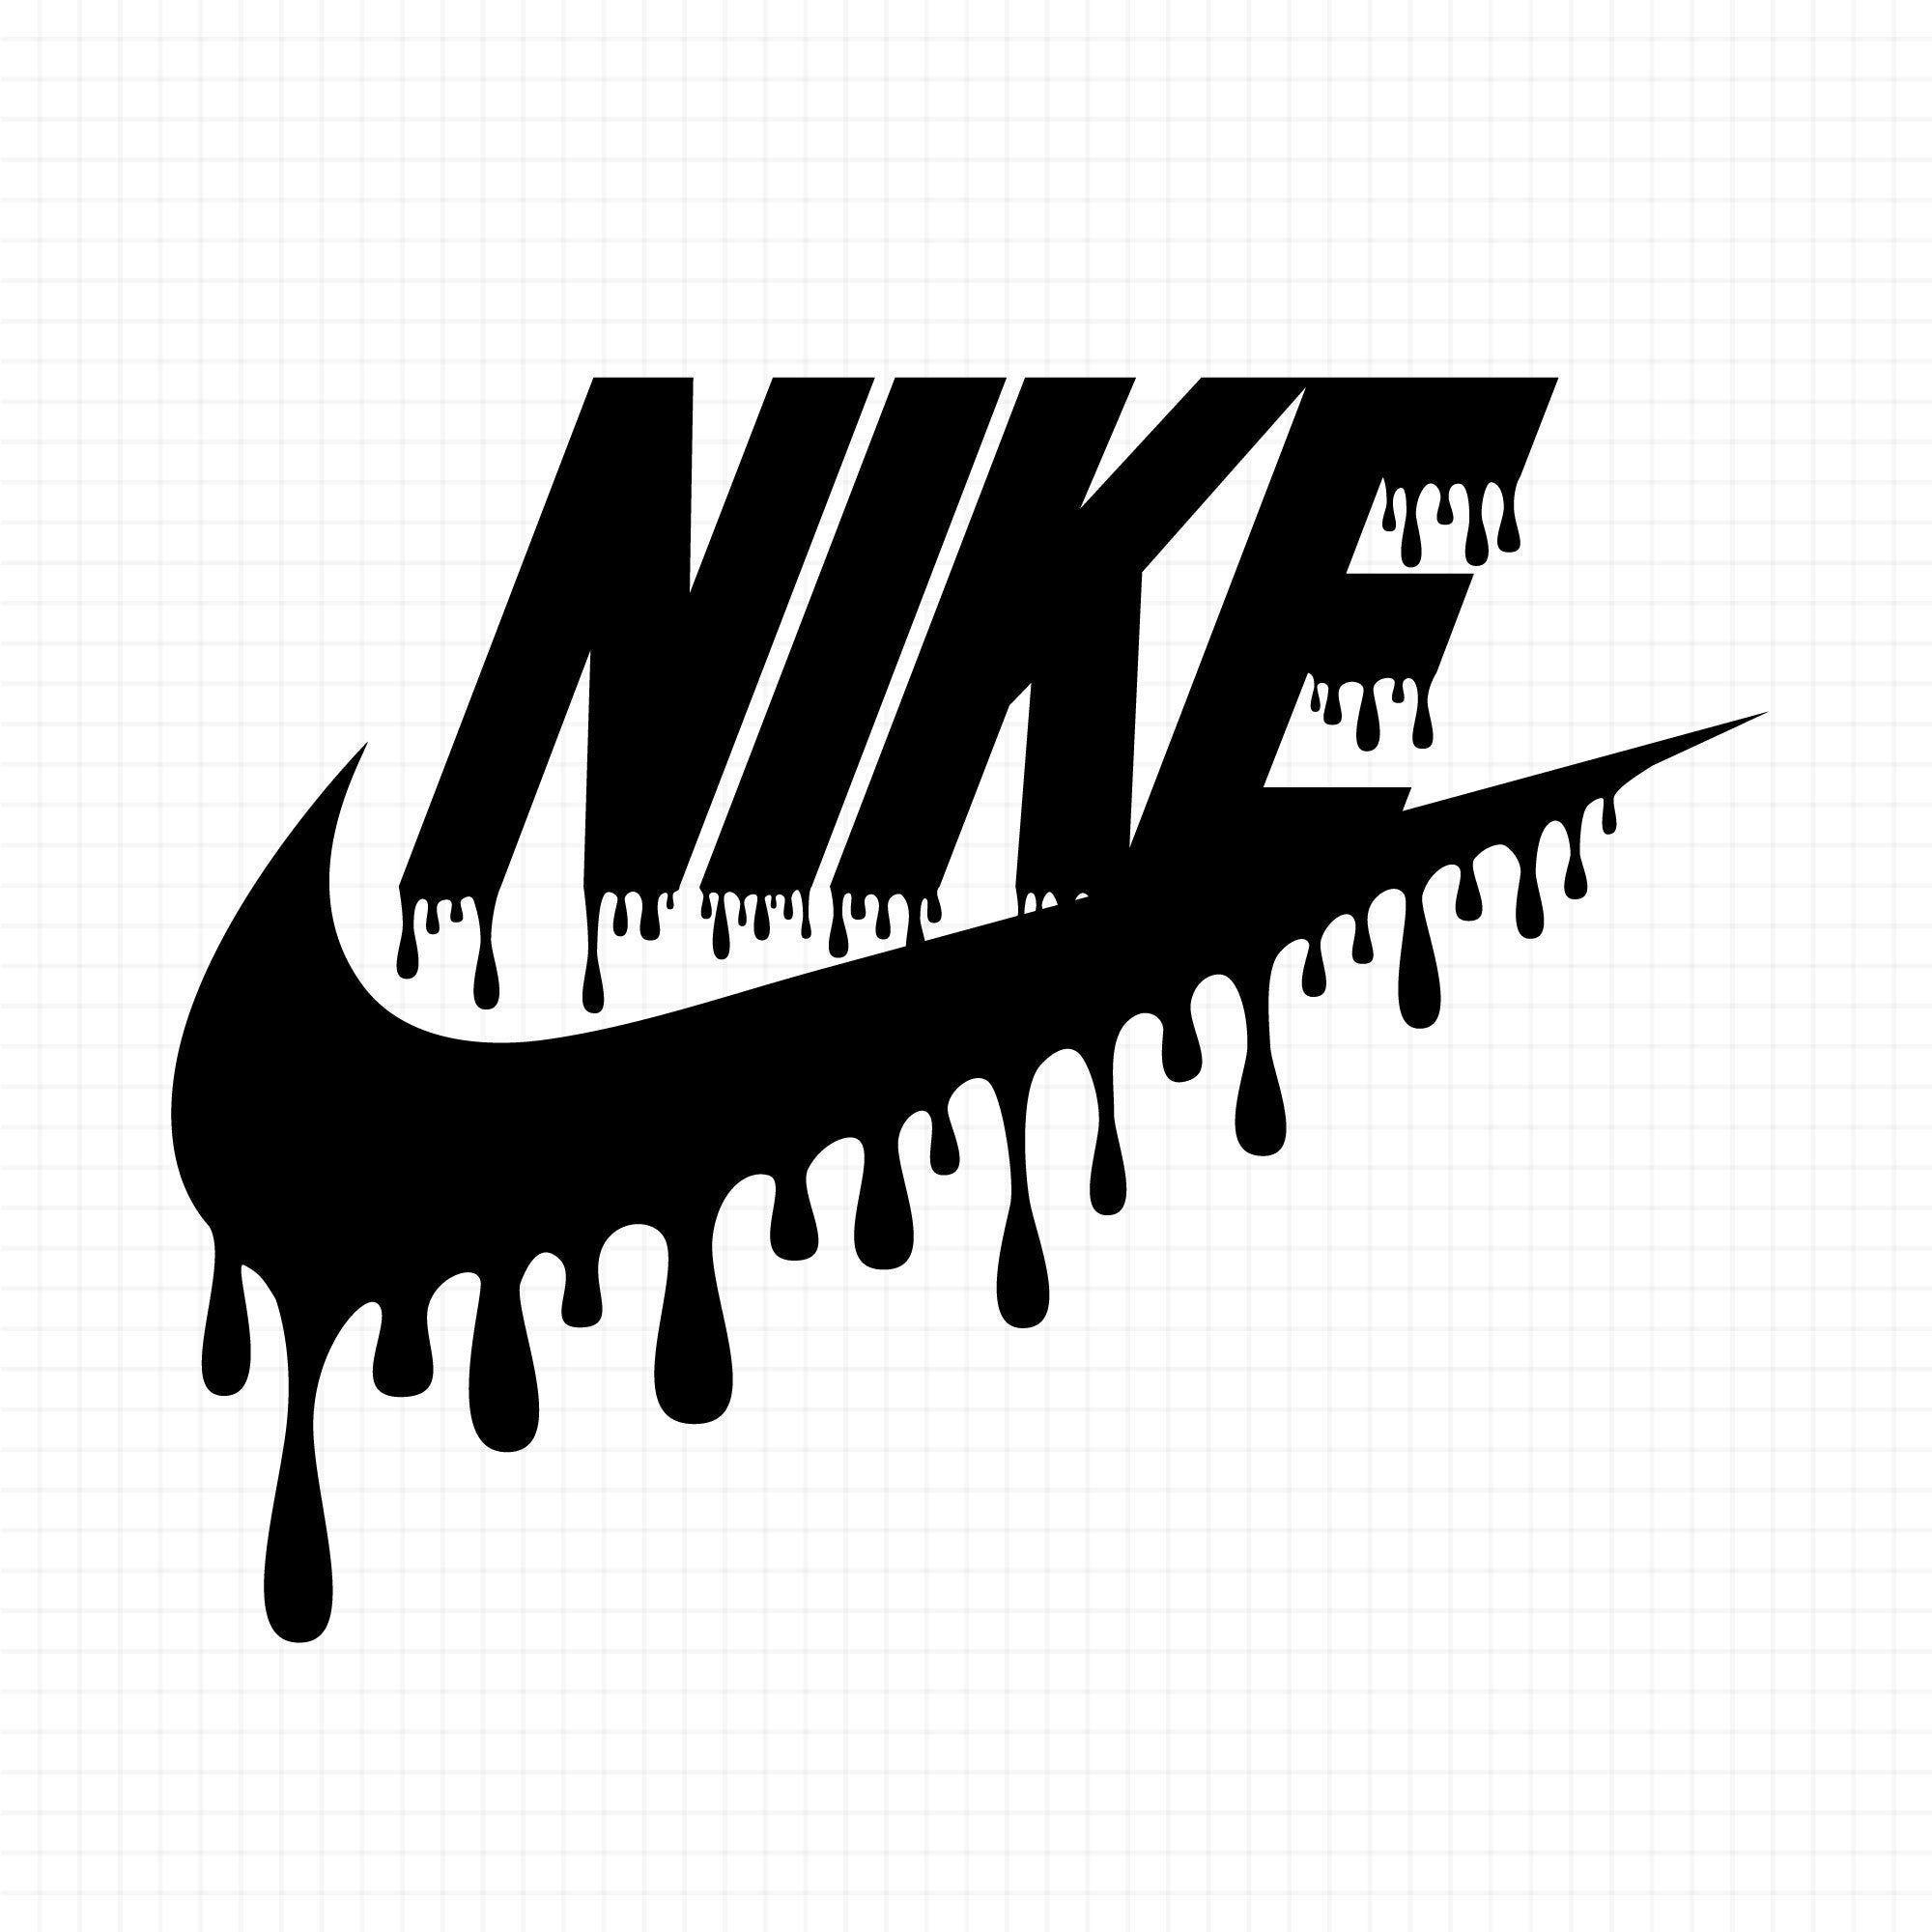 Nike SVG Nike logo svg Nike png Nike vector Etsy in 2020